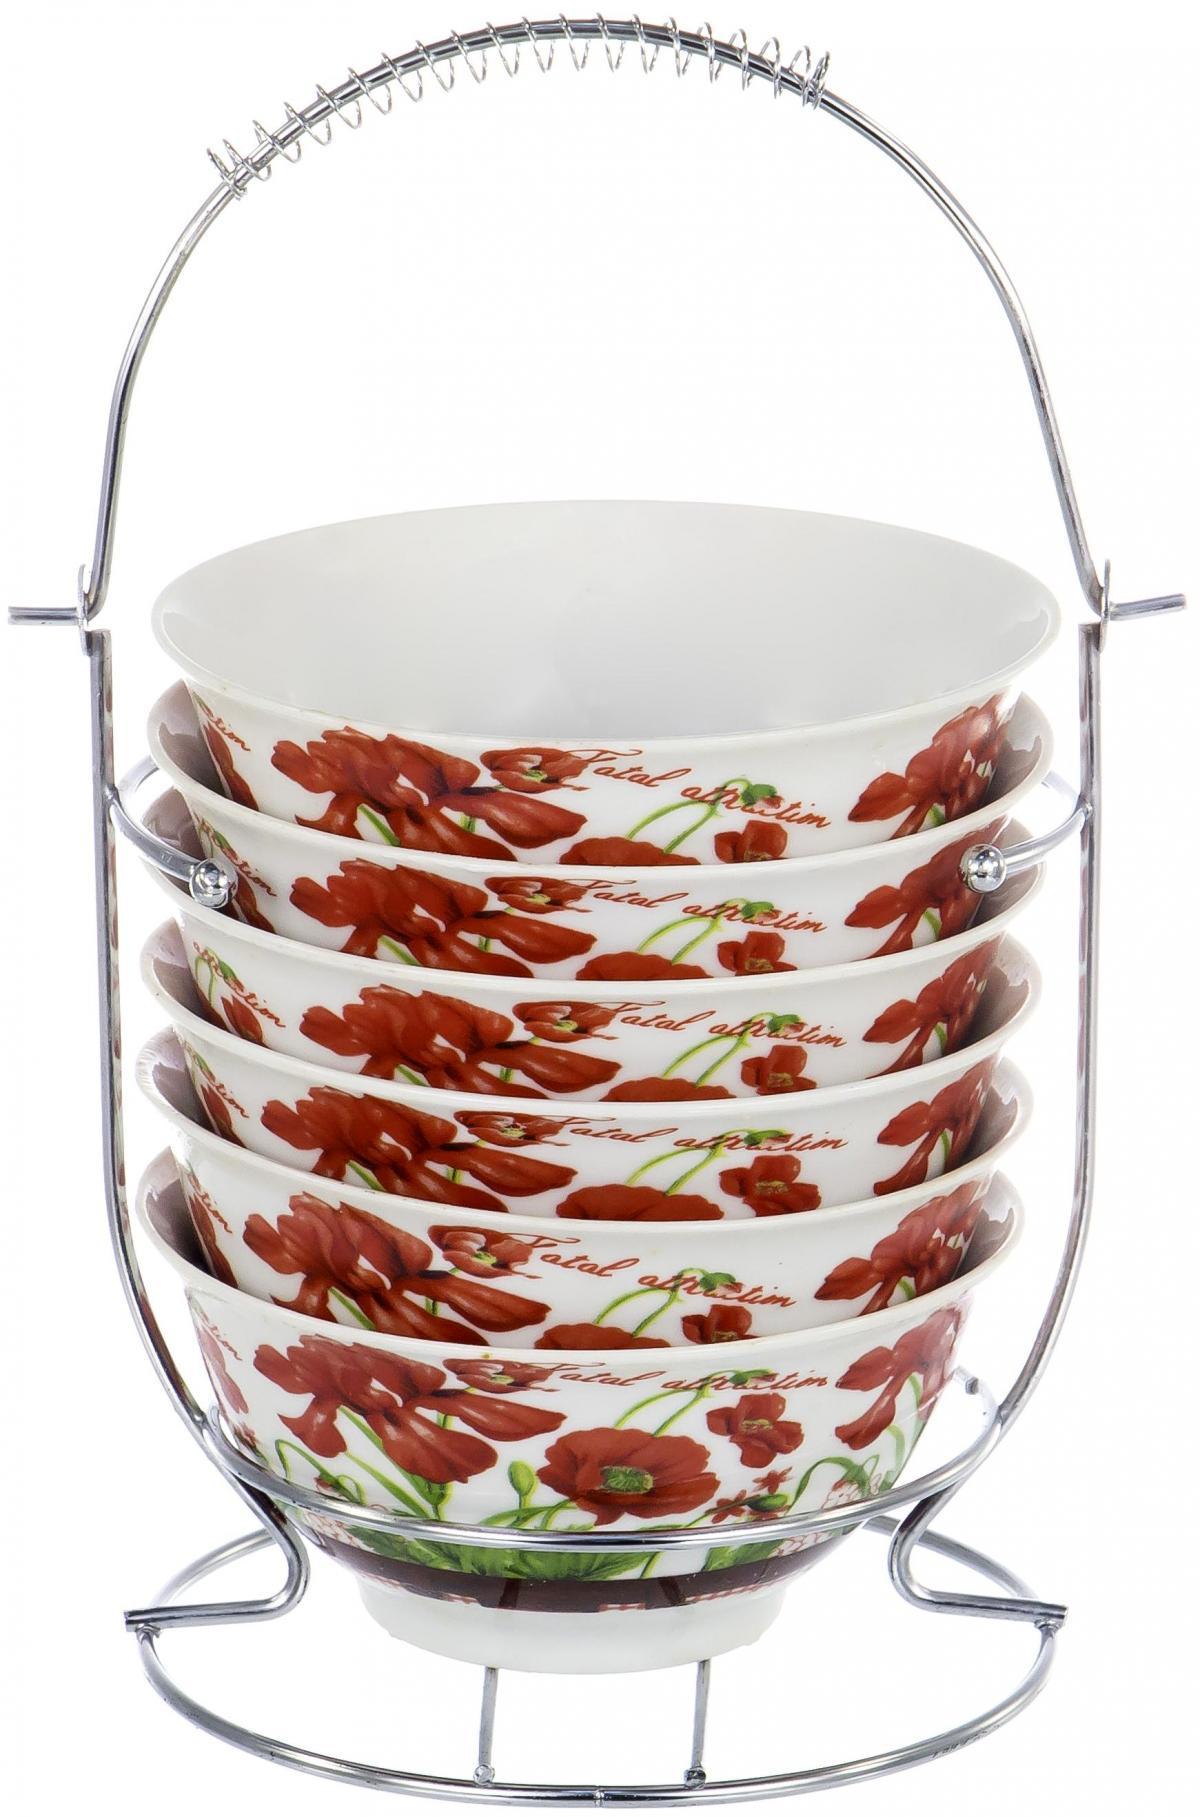 Набор салатников Olaff Bowl Set, 6 предметов. DL-BS6MS-153DL-BS6MS-153BOWL SET, набор (6) 6 салатников 300мл на метал.стенде, подарочная упаковка